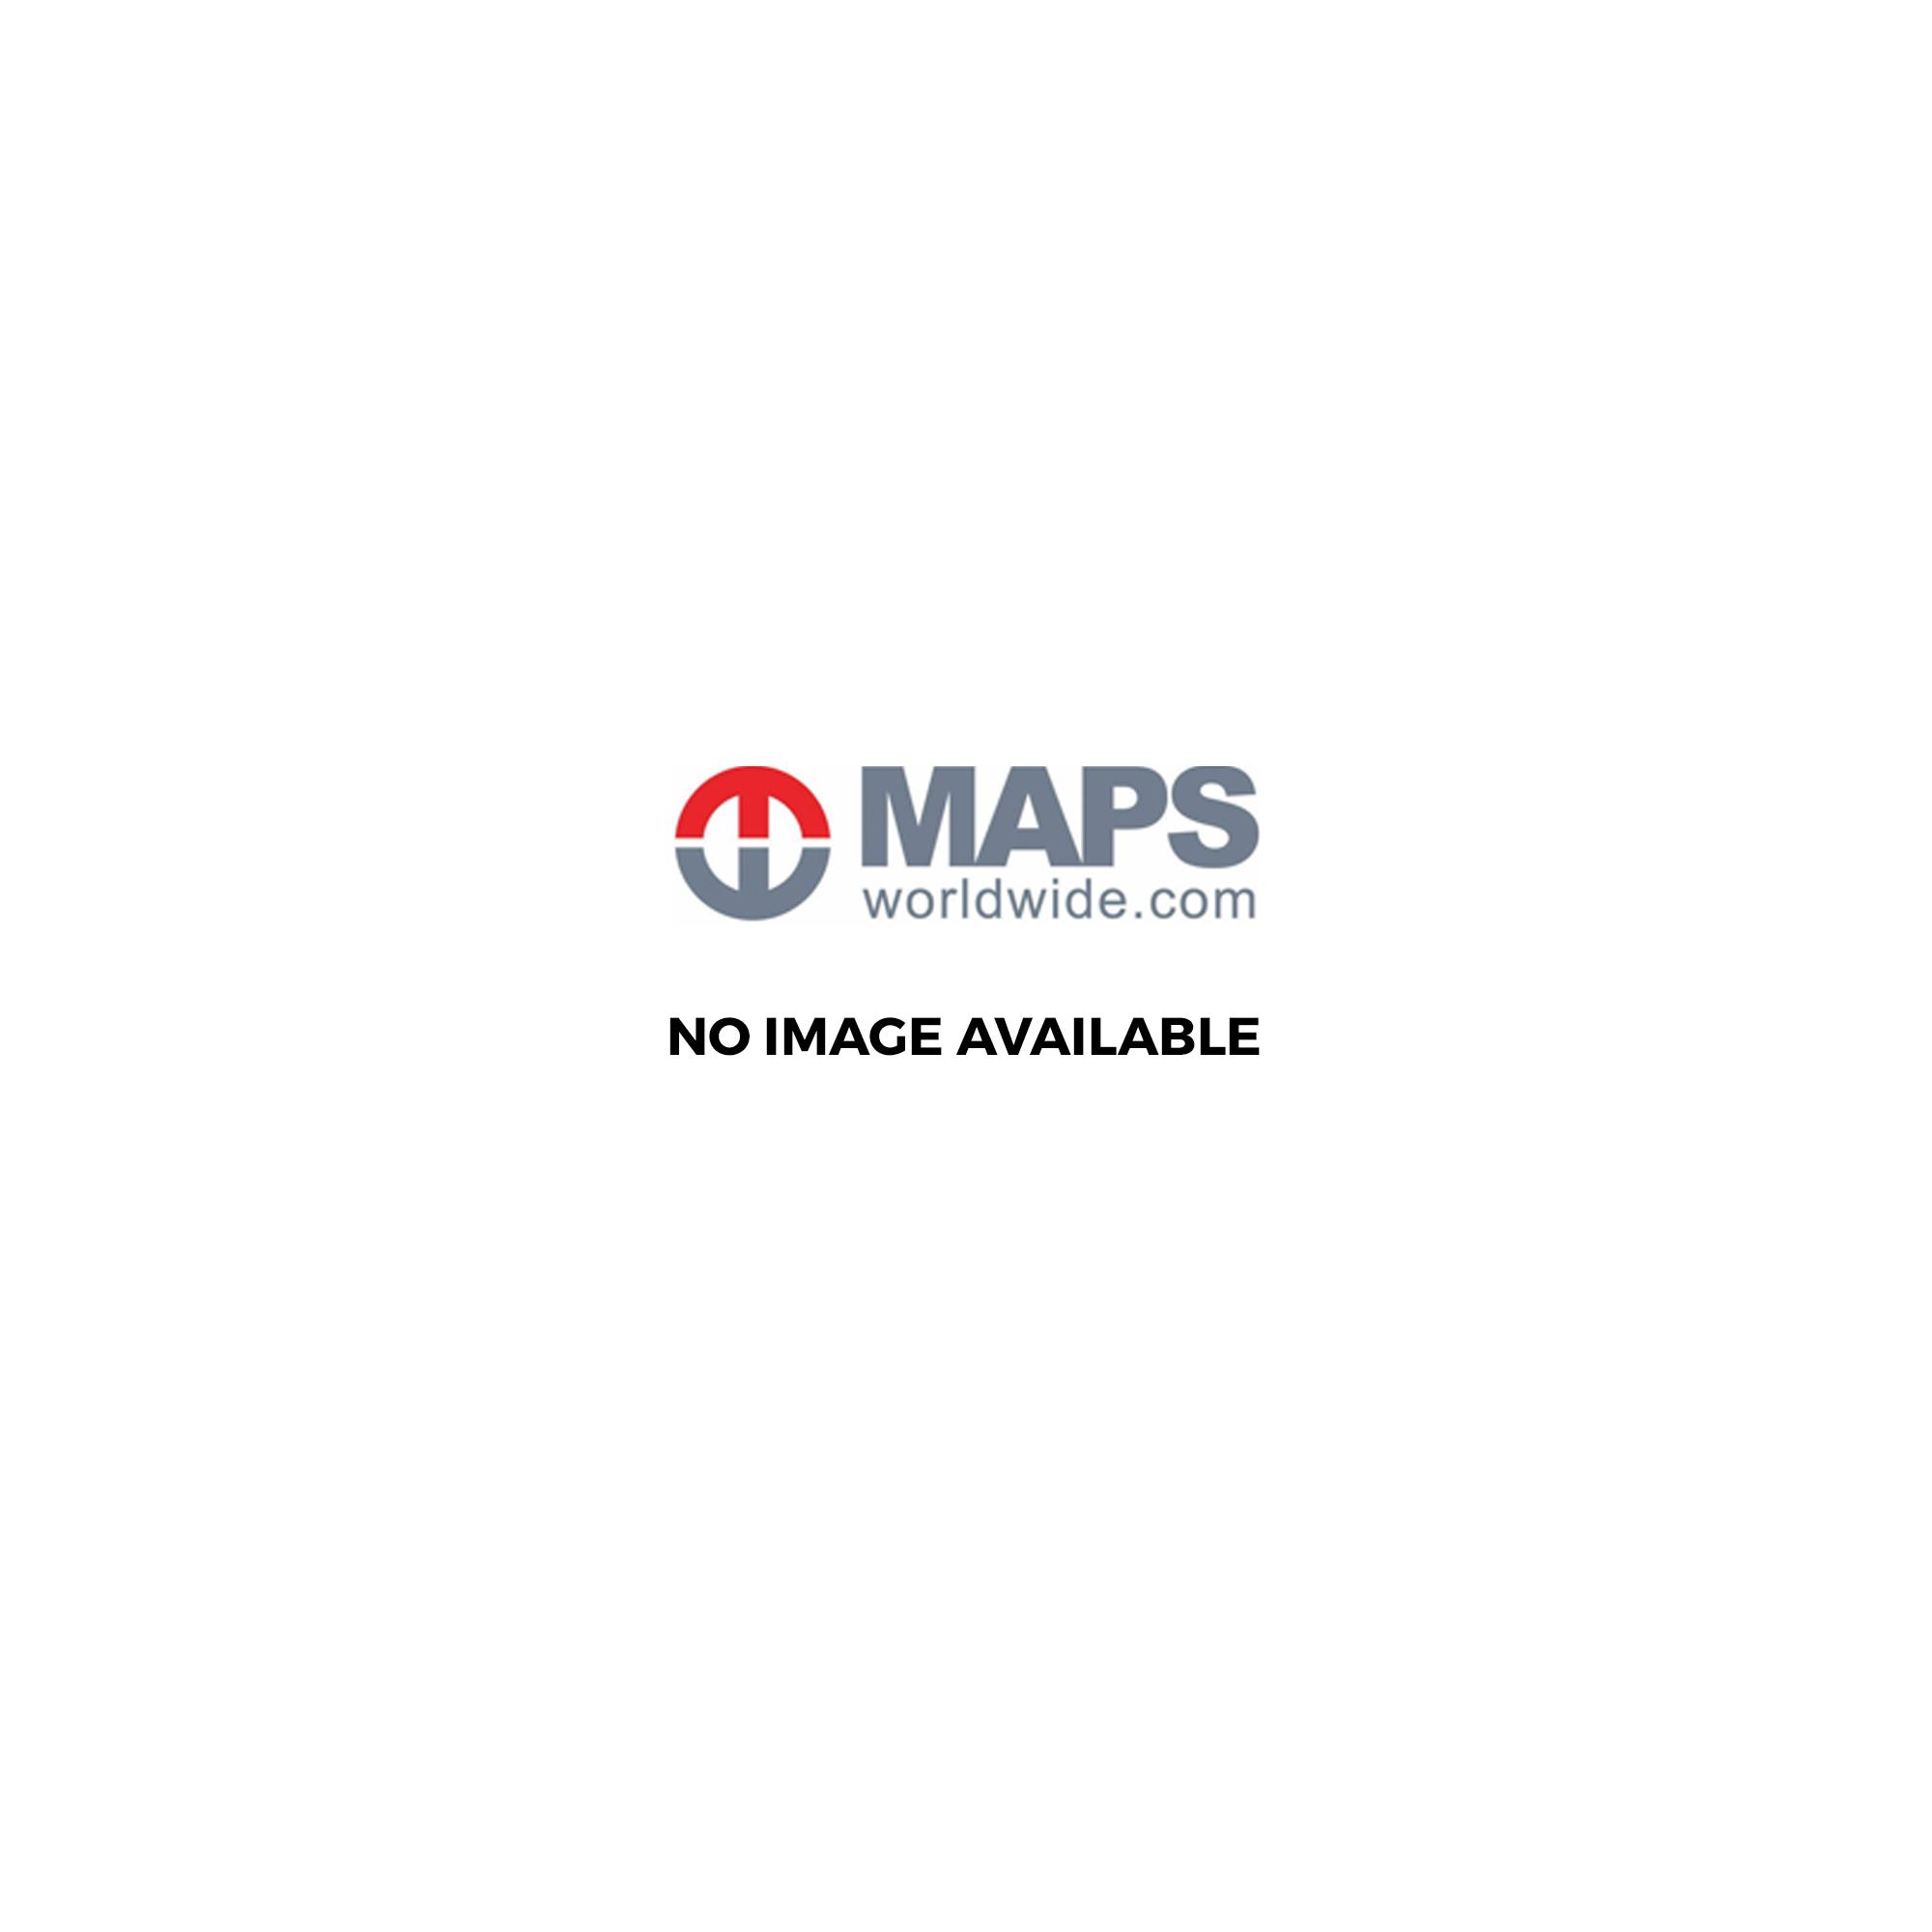 TOP100: 148 Clermont-Ferrand / Mauriac map on council of clermont map, munich map, saumur map, newcastle upon tyne map, le havre map, utrecht map, carcassonne map, london map, trieste map, cluj-napoca map, mont saint-michel map, boulogne-sur-mer map, seine map, rennes map, cahors map, vila nova de gaia map, turku map, arras map, evian-les-bains map, strasbourg map,